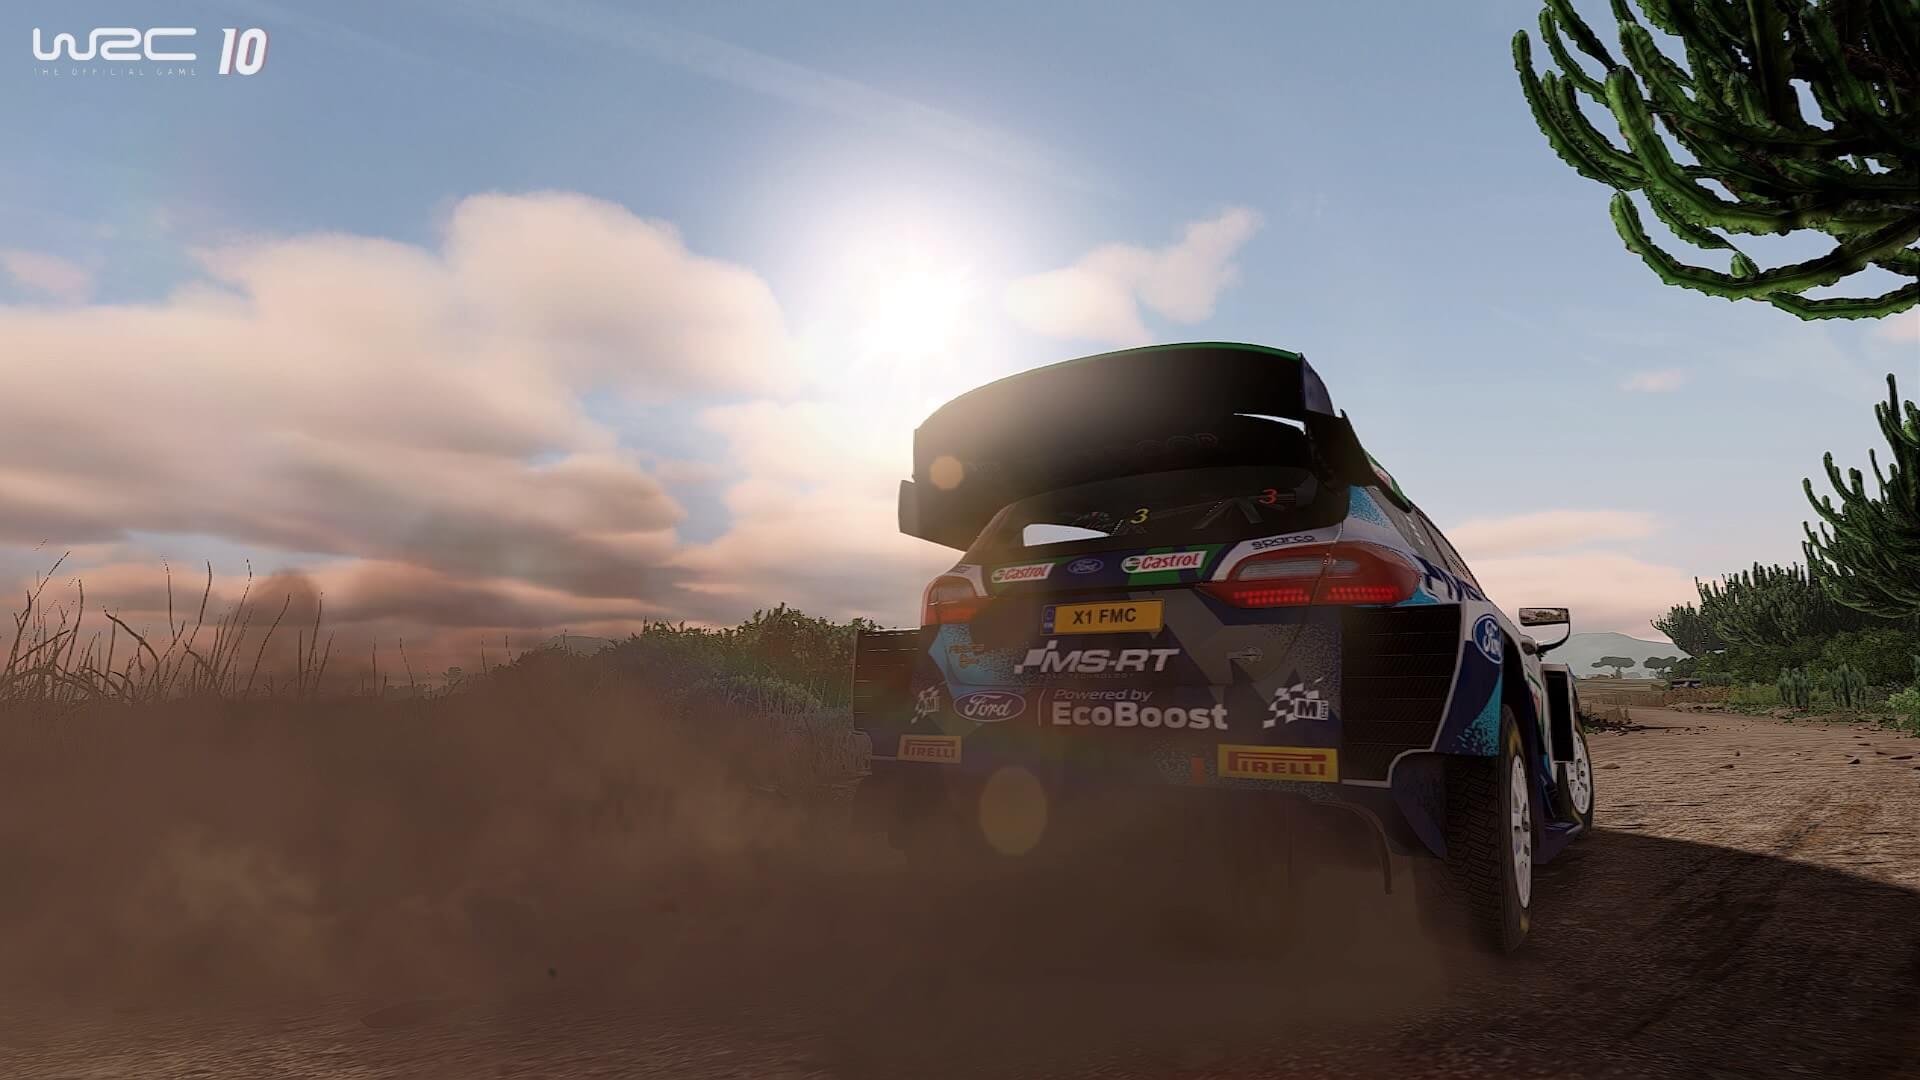 wrc 10 fia world rally championship 20210913211216